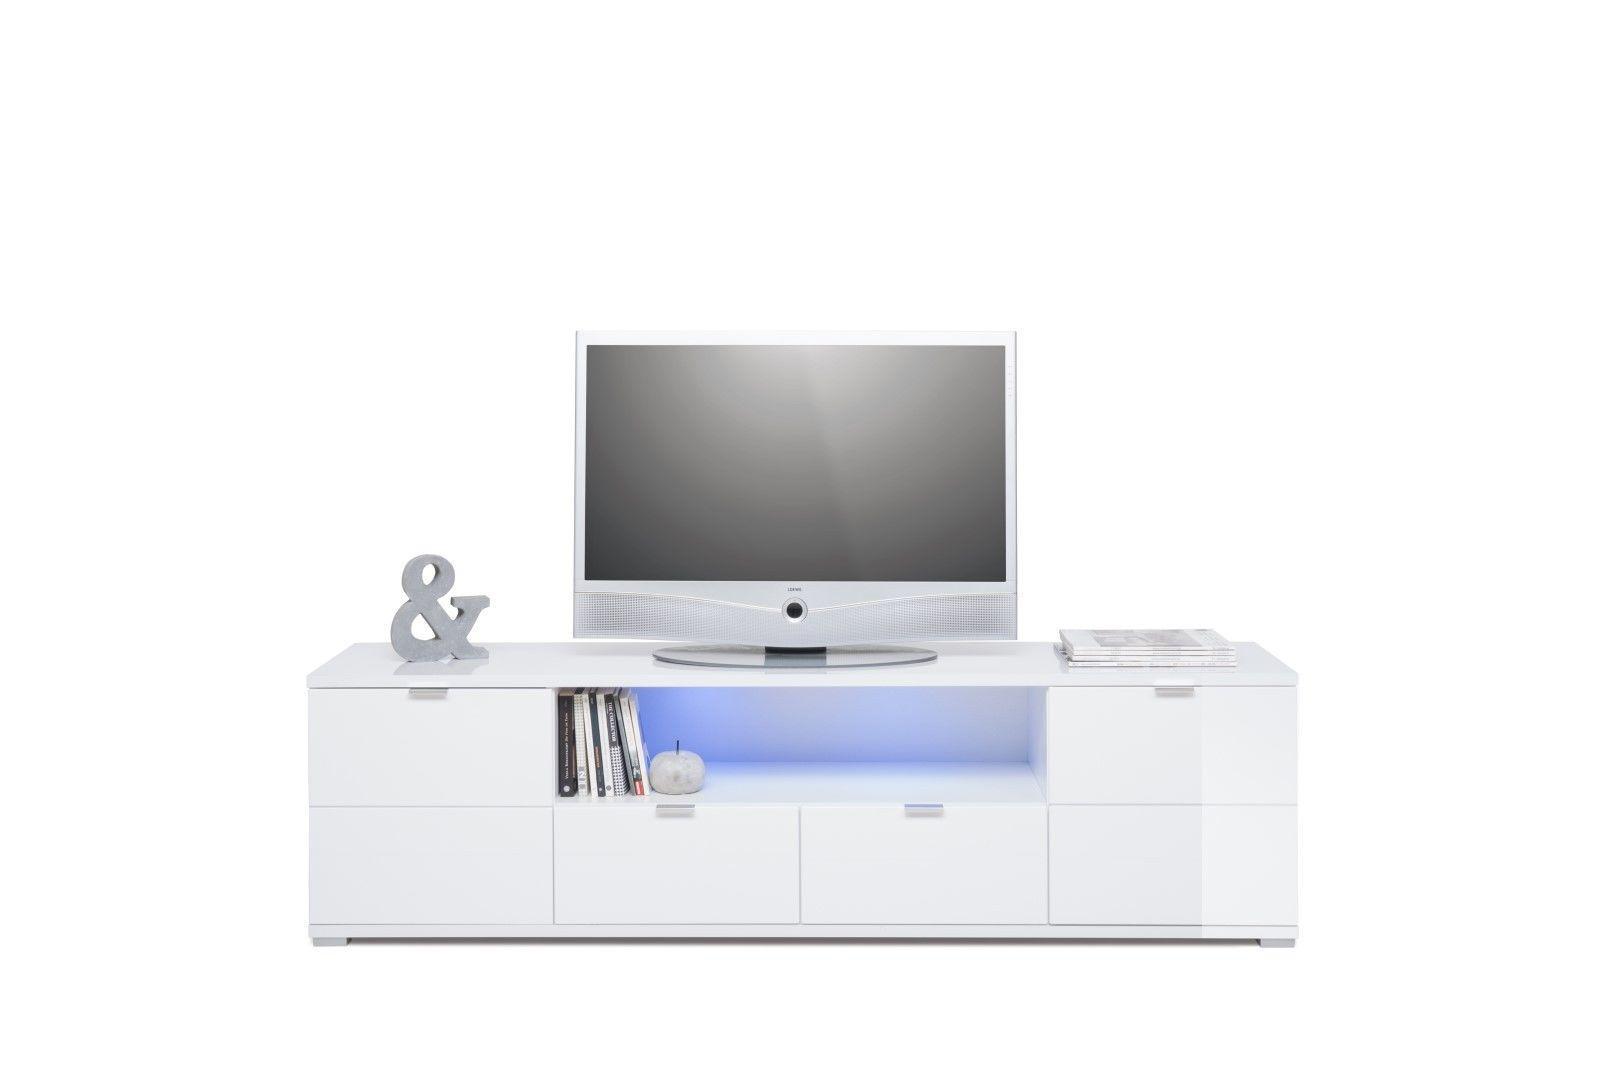 tv board lowboard shine hochglanz weiss inkl beleuchtung 180cm kaufen bei sylwia. Black Bedroom Furniture Sets. Home Design Ideas